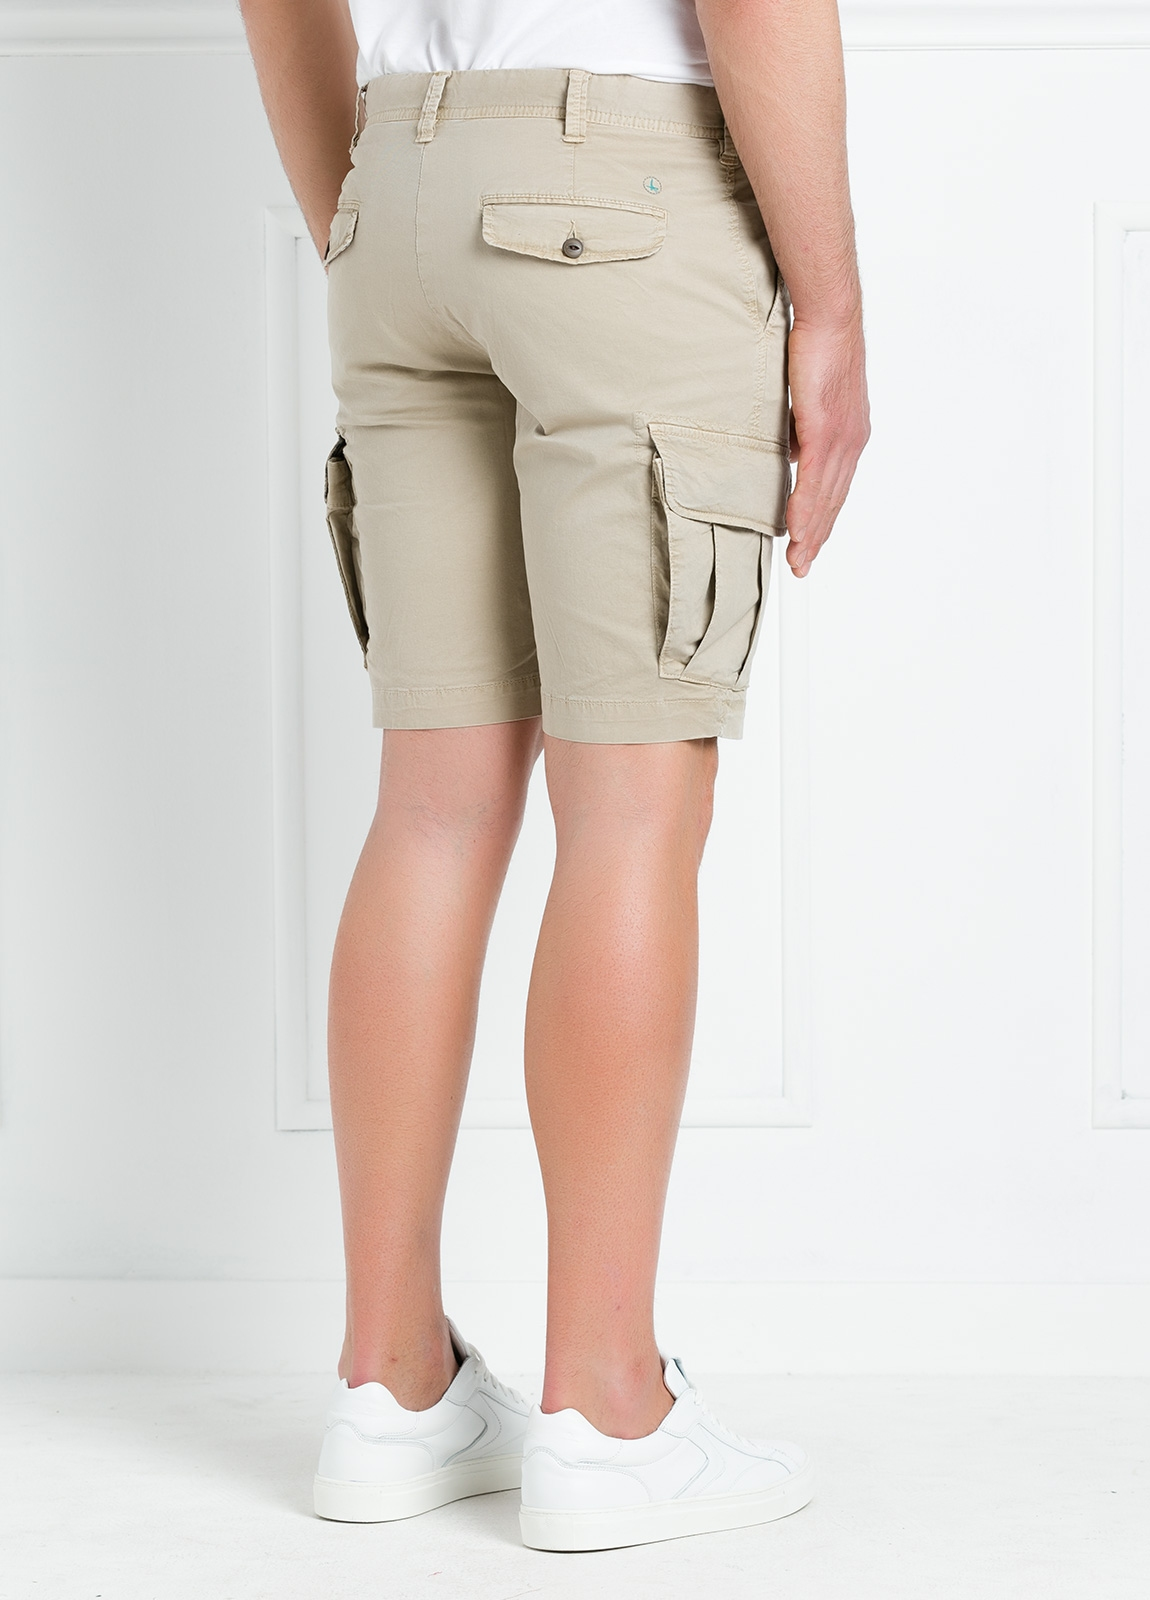 Bermuda modelo BILL 334 slim fit con bolsillos laterales. Color beige. - Ítem1